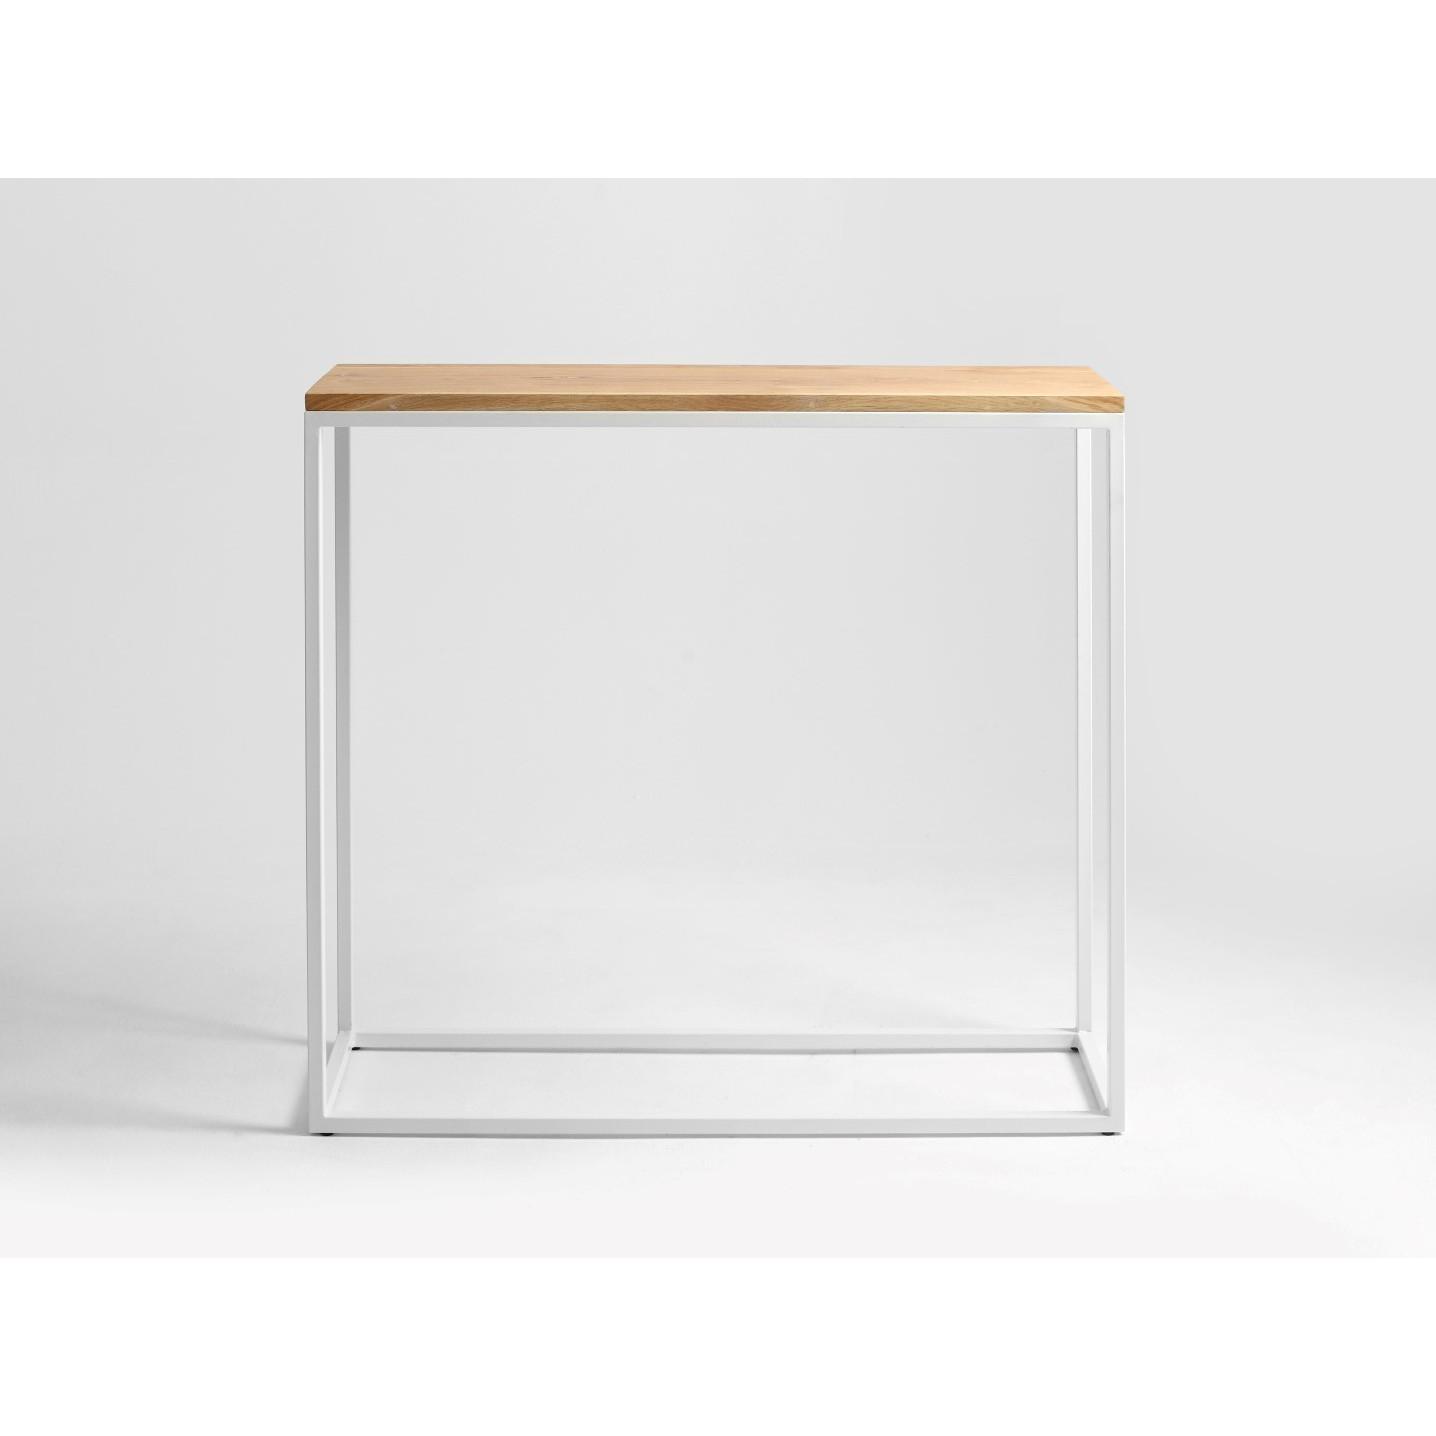 Rack Julita 92 cm | Oak/White